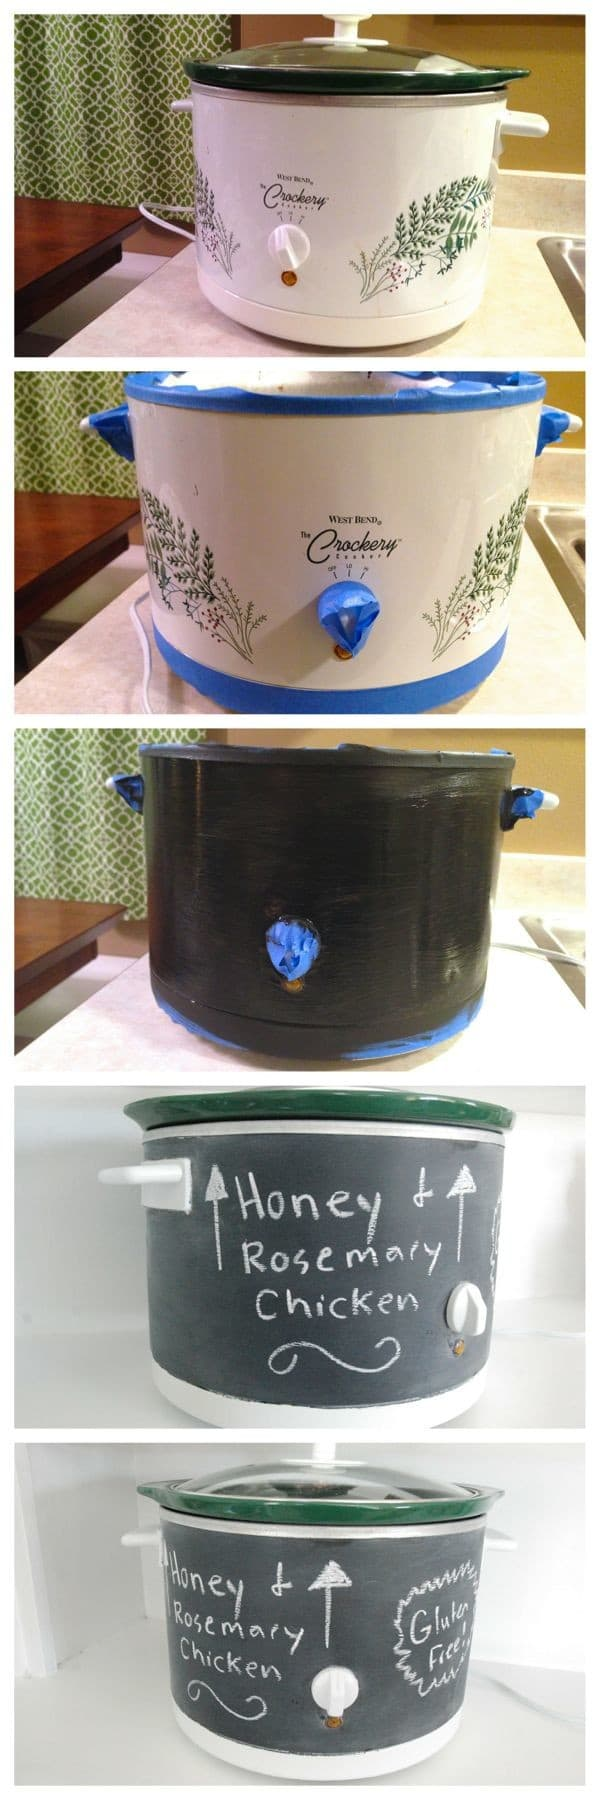 Chalkboard Paint your Crockpot